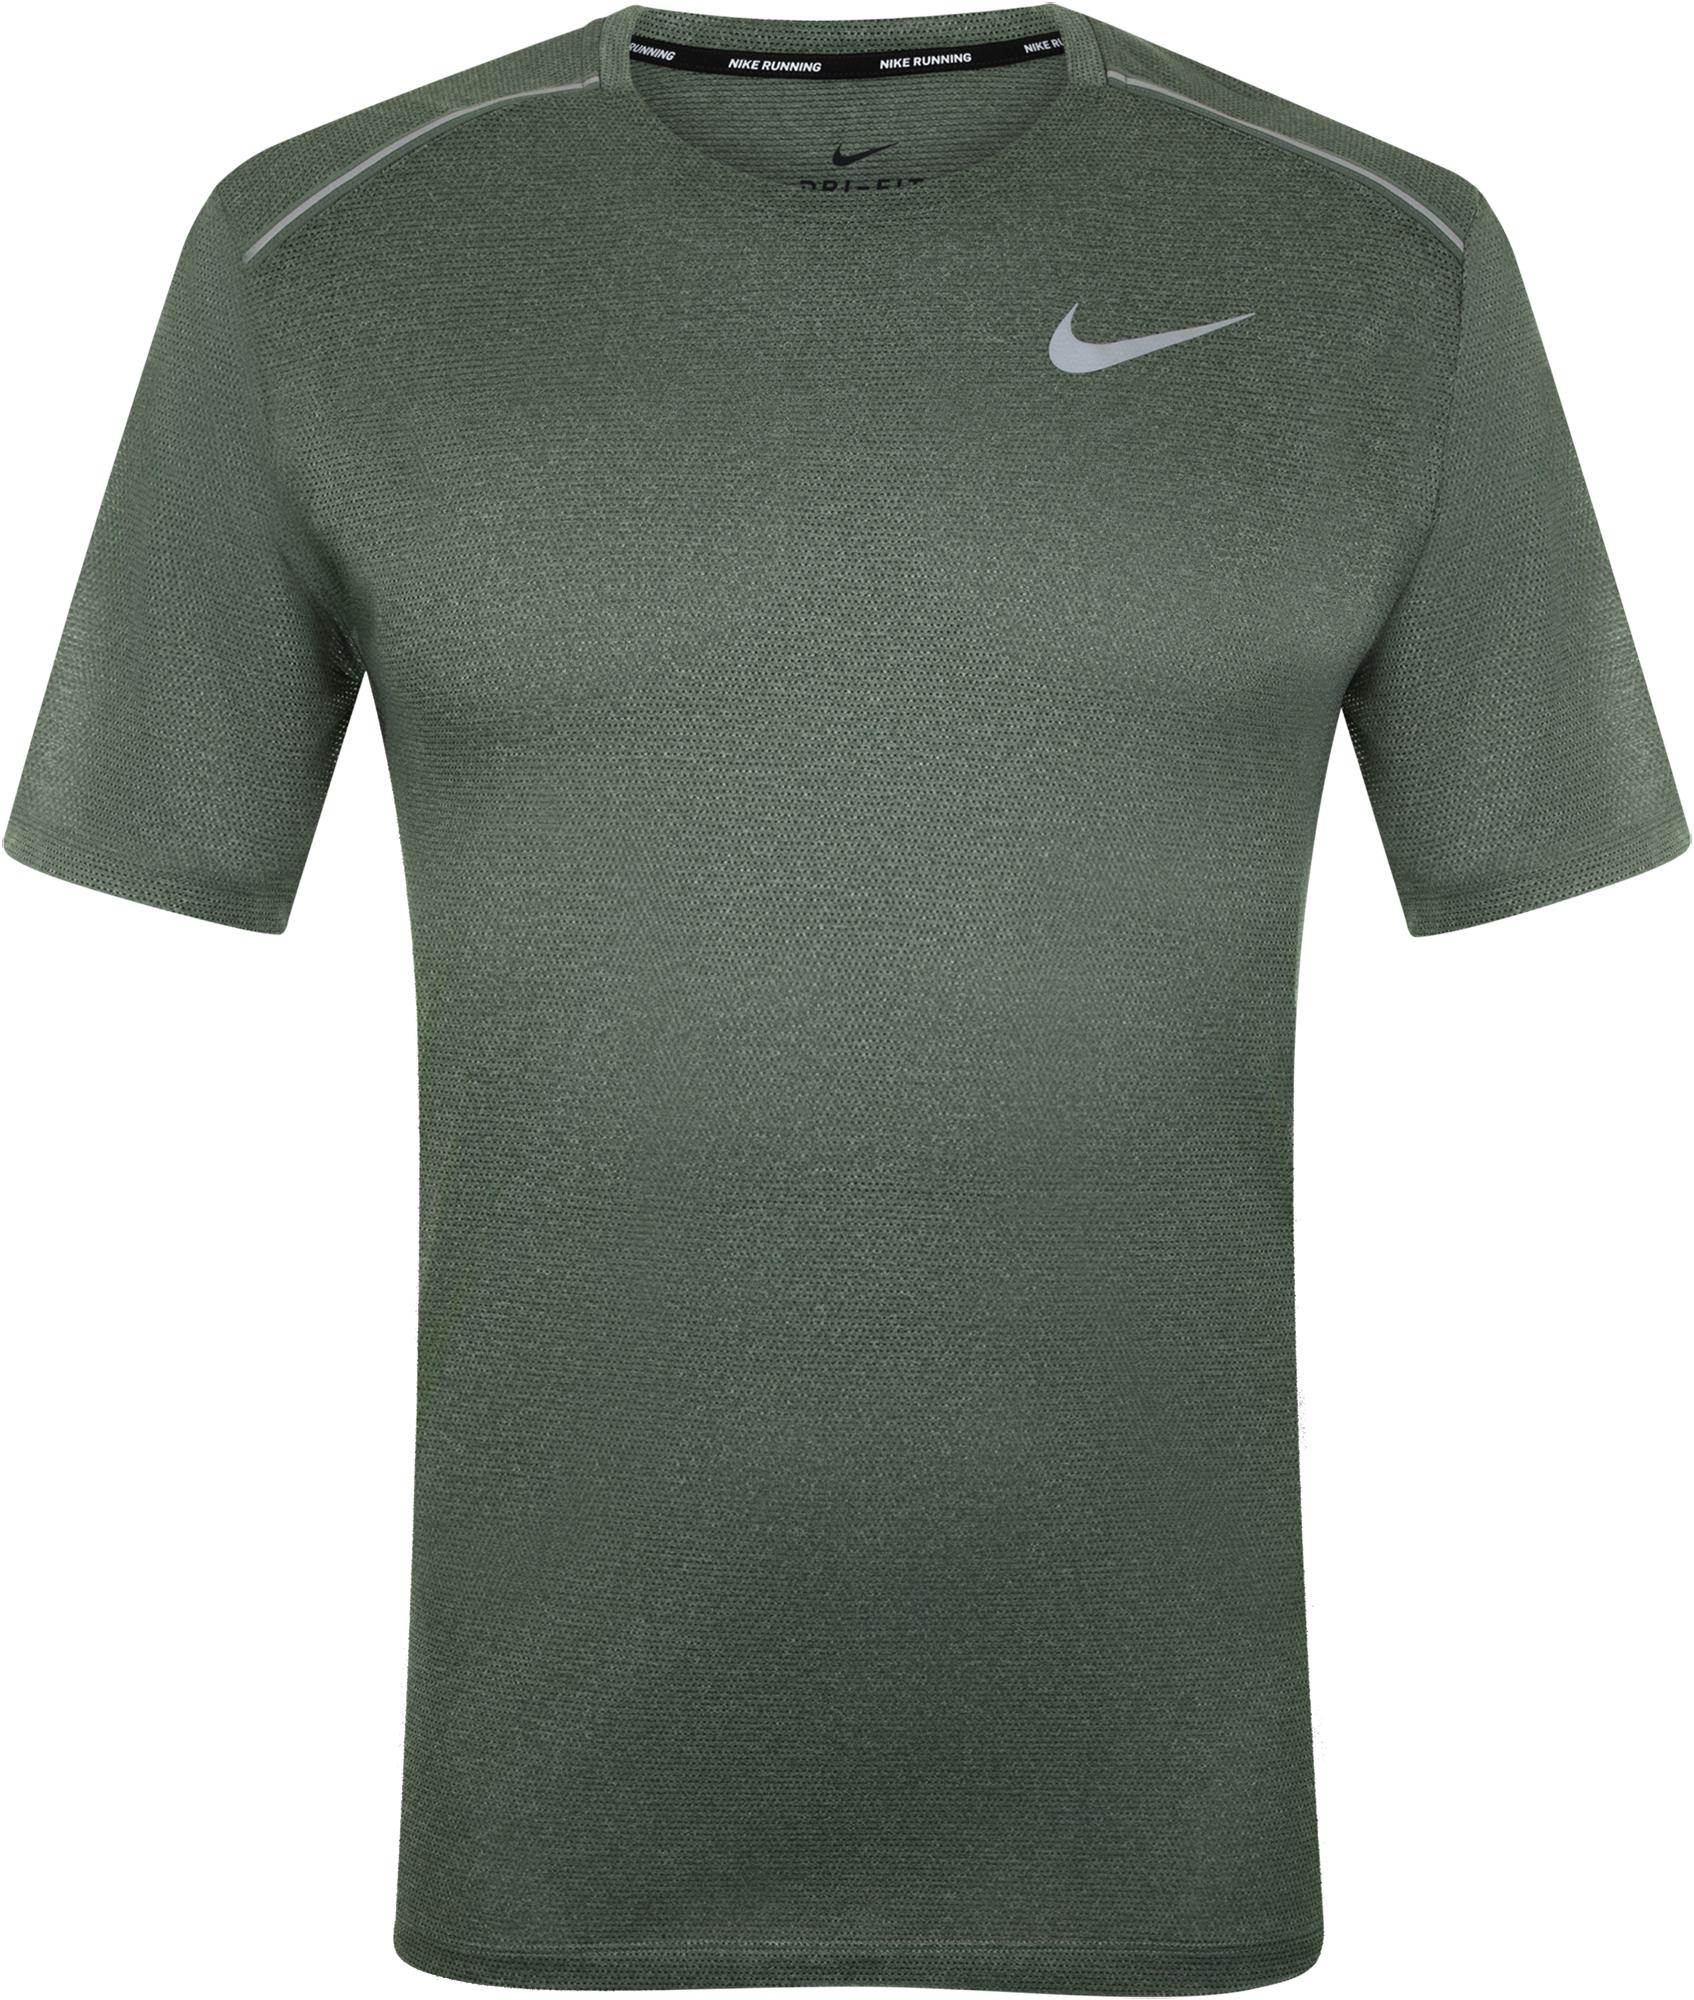 Nike Футболка мужская Nike Dry Cool Miler, размер 44-46 nike футболка мужская nike cool miler